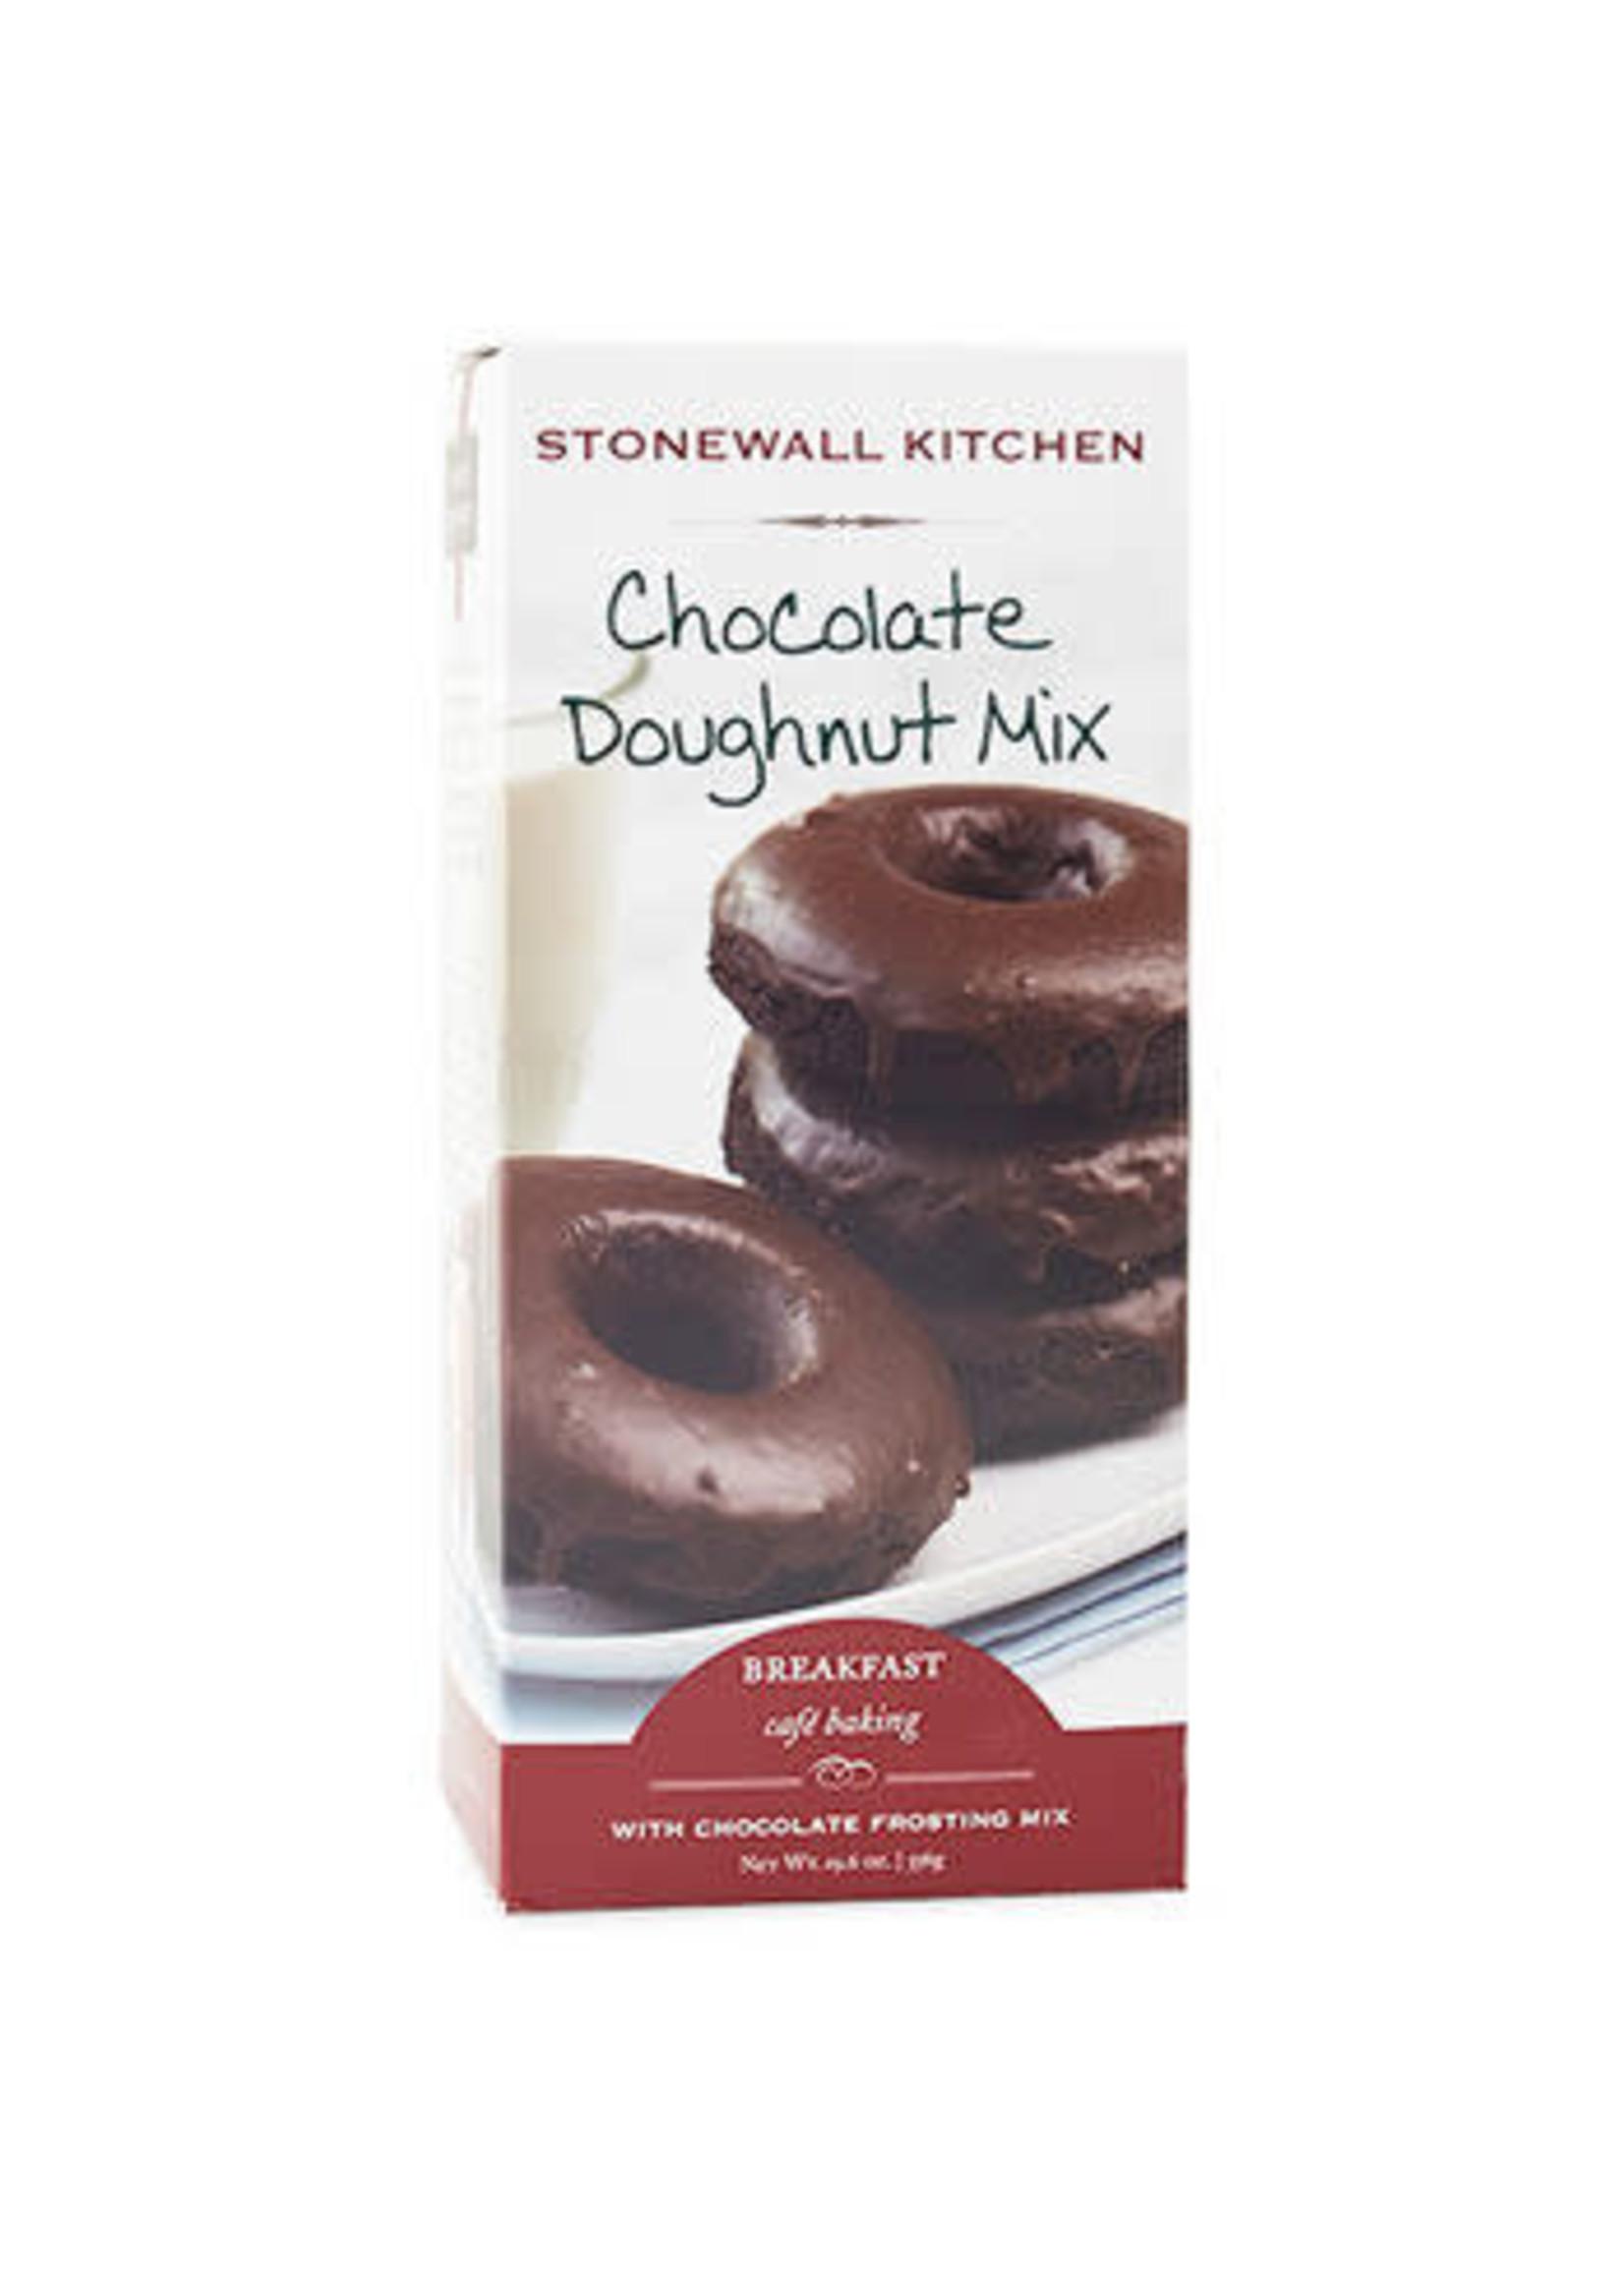 Stonewall Kitchen Chocolate Doughnut Mix w/Chocolate Frosting